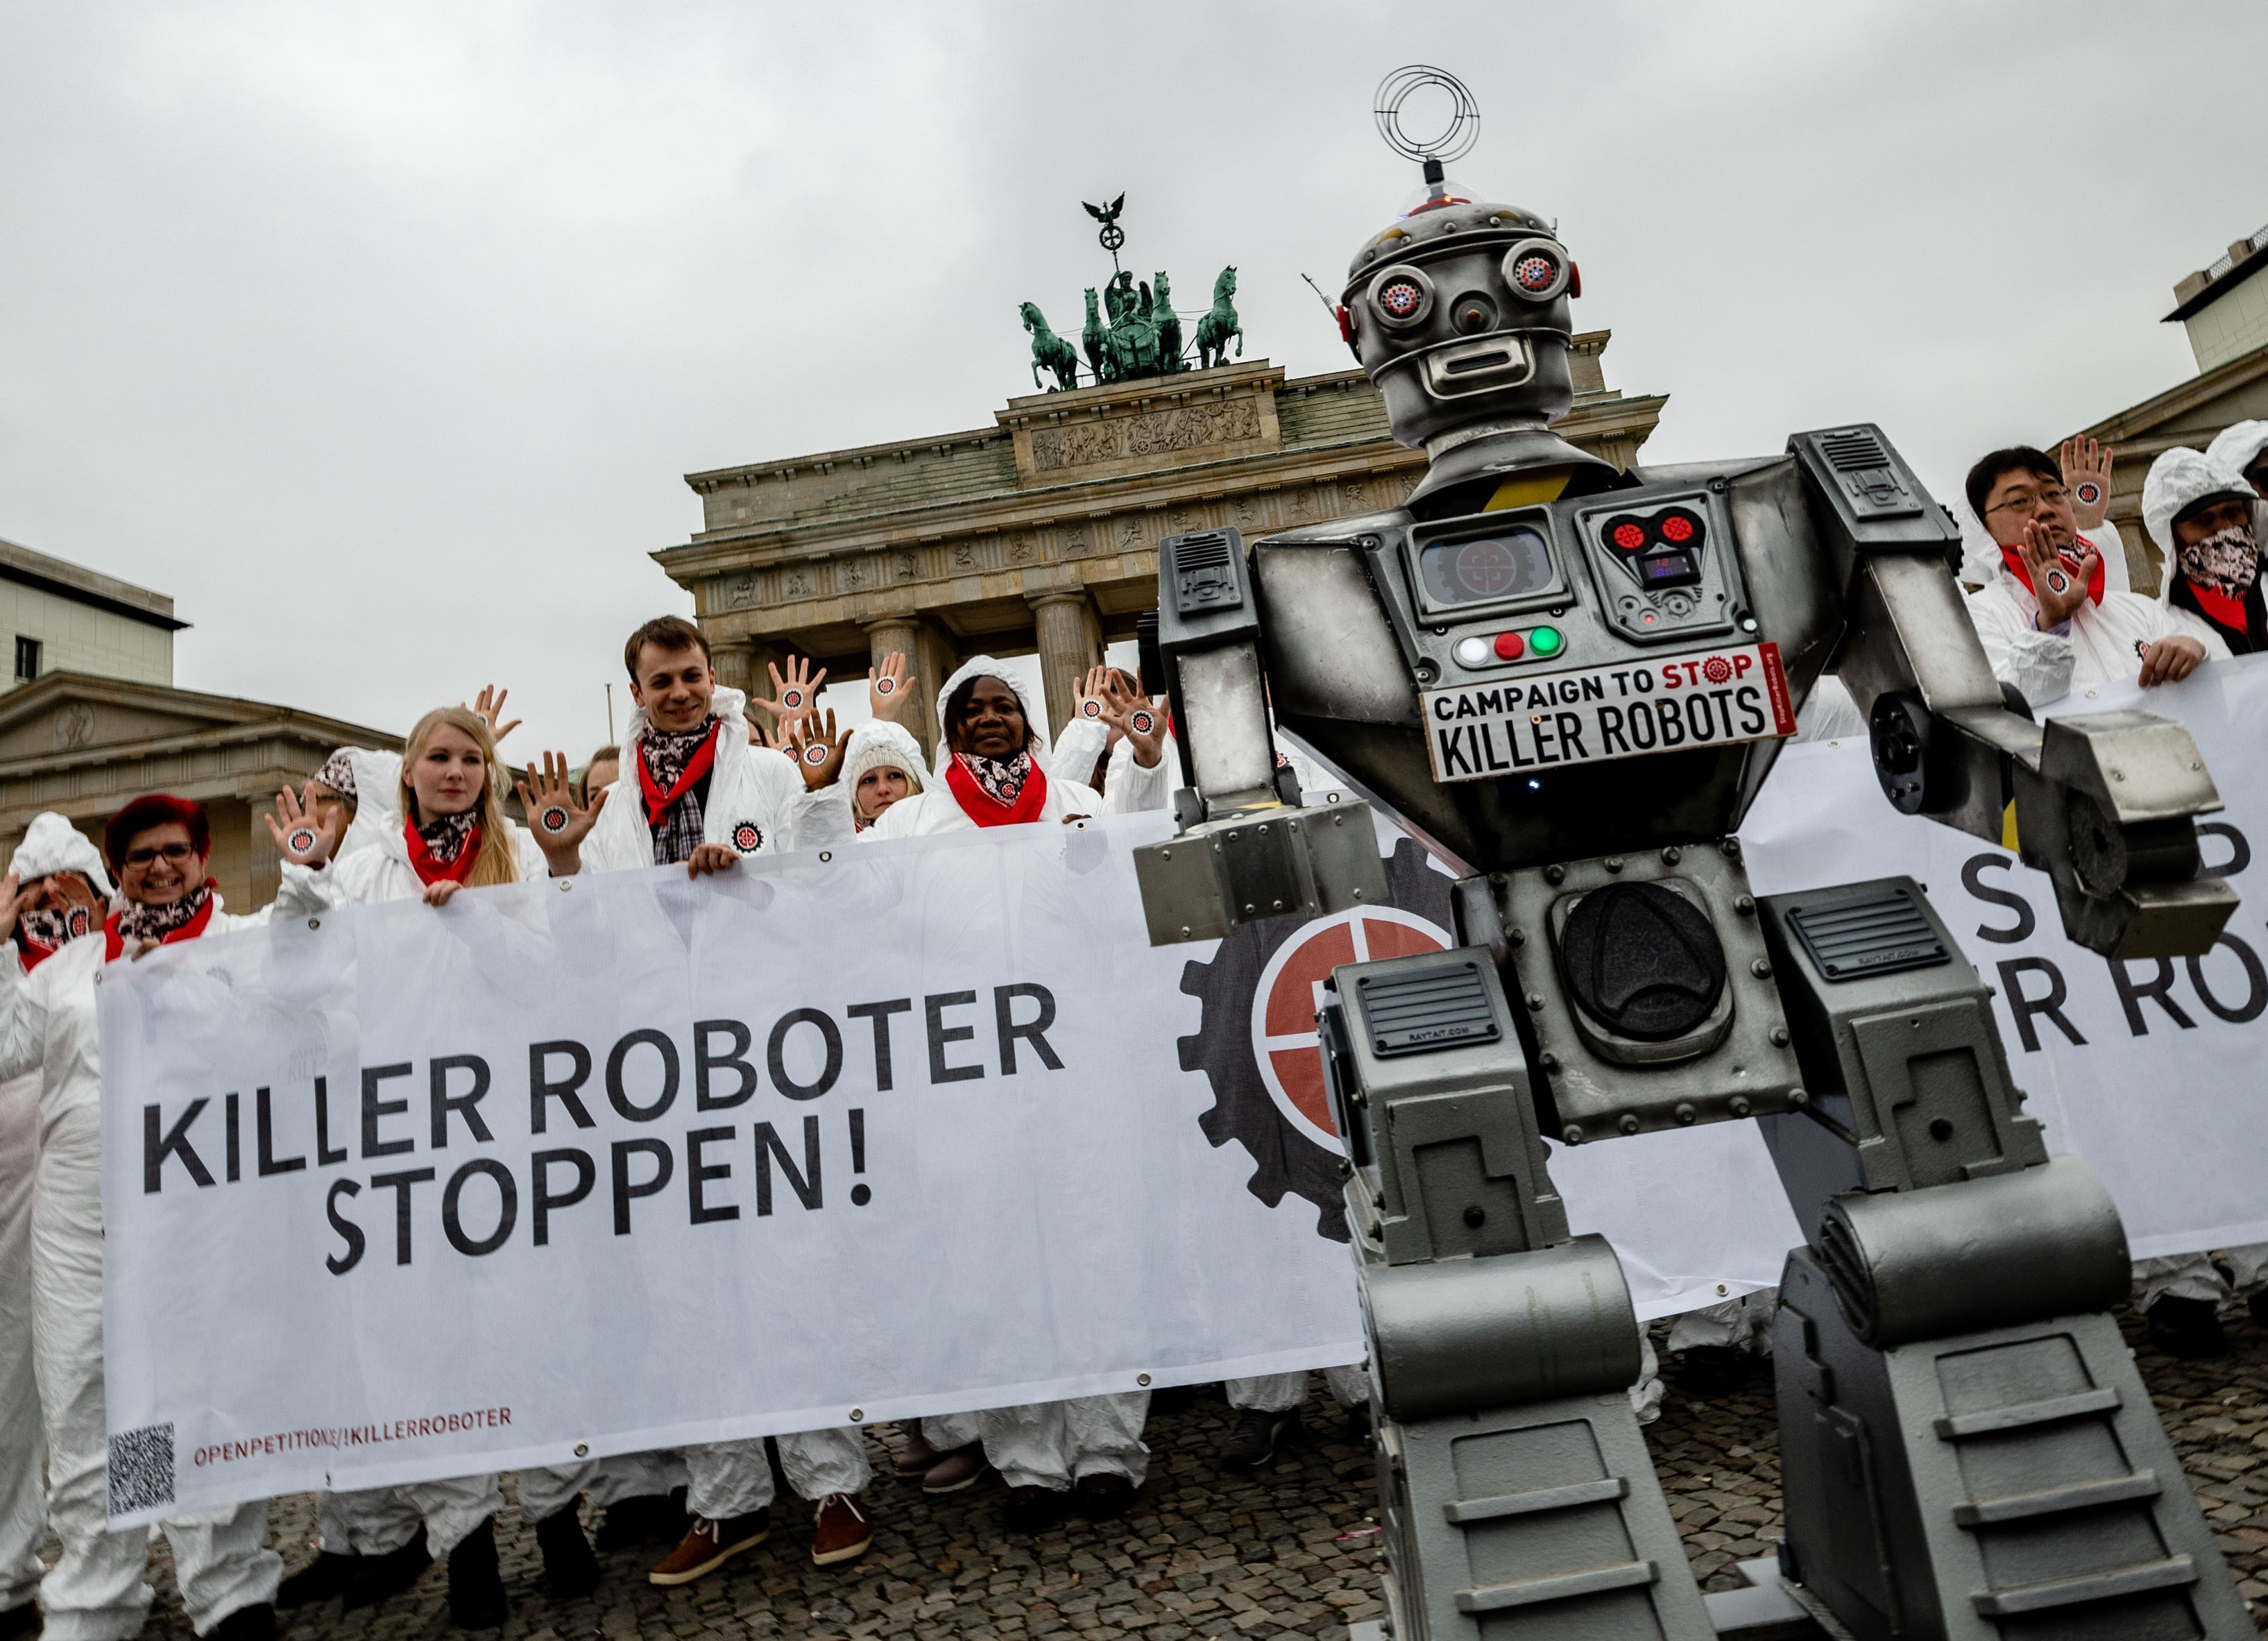 New European poll shows public favour banning killer robots